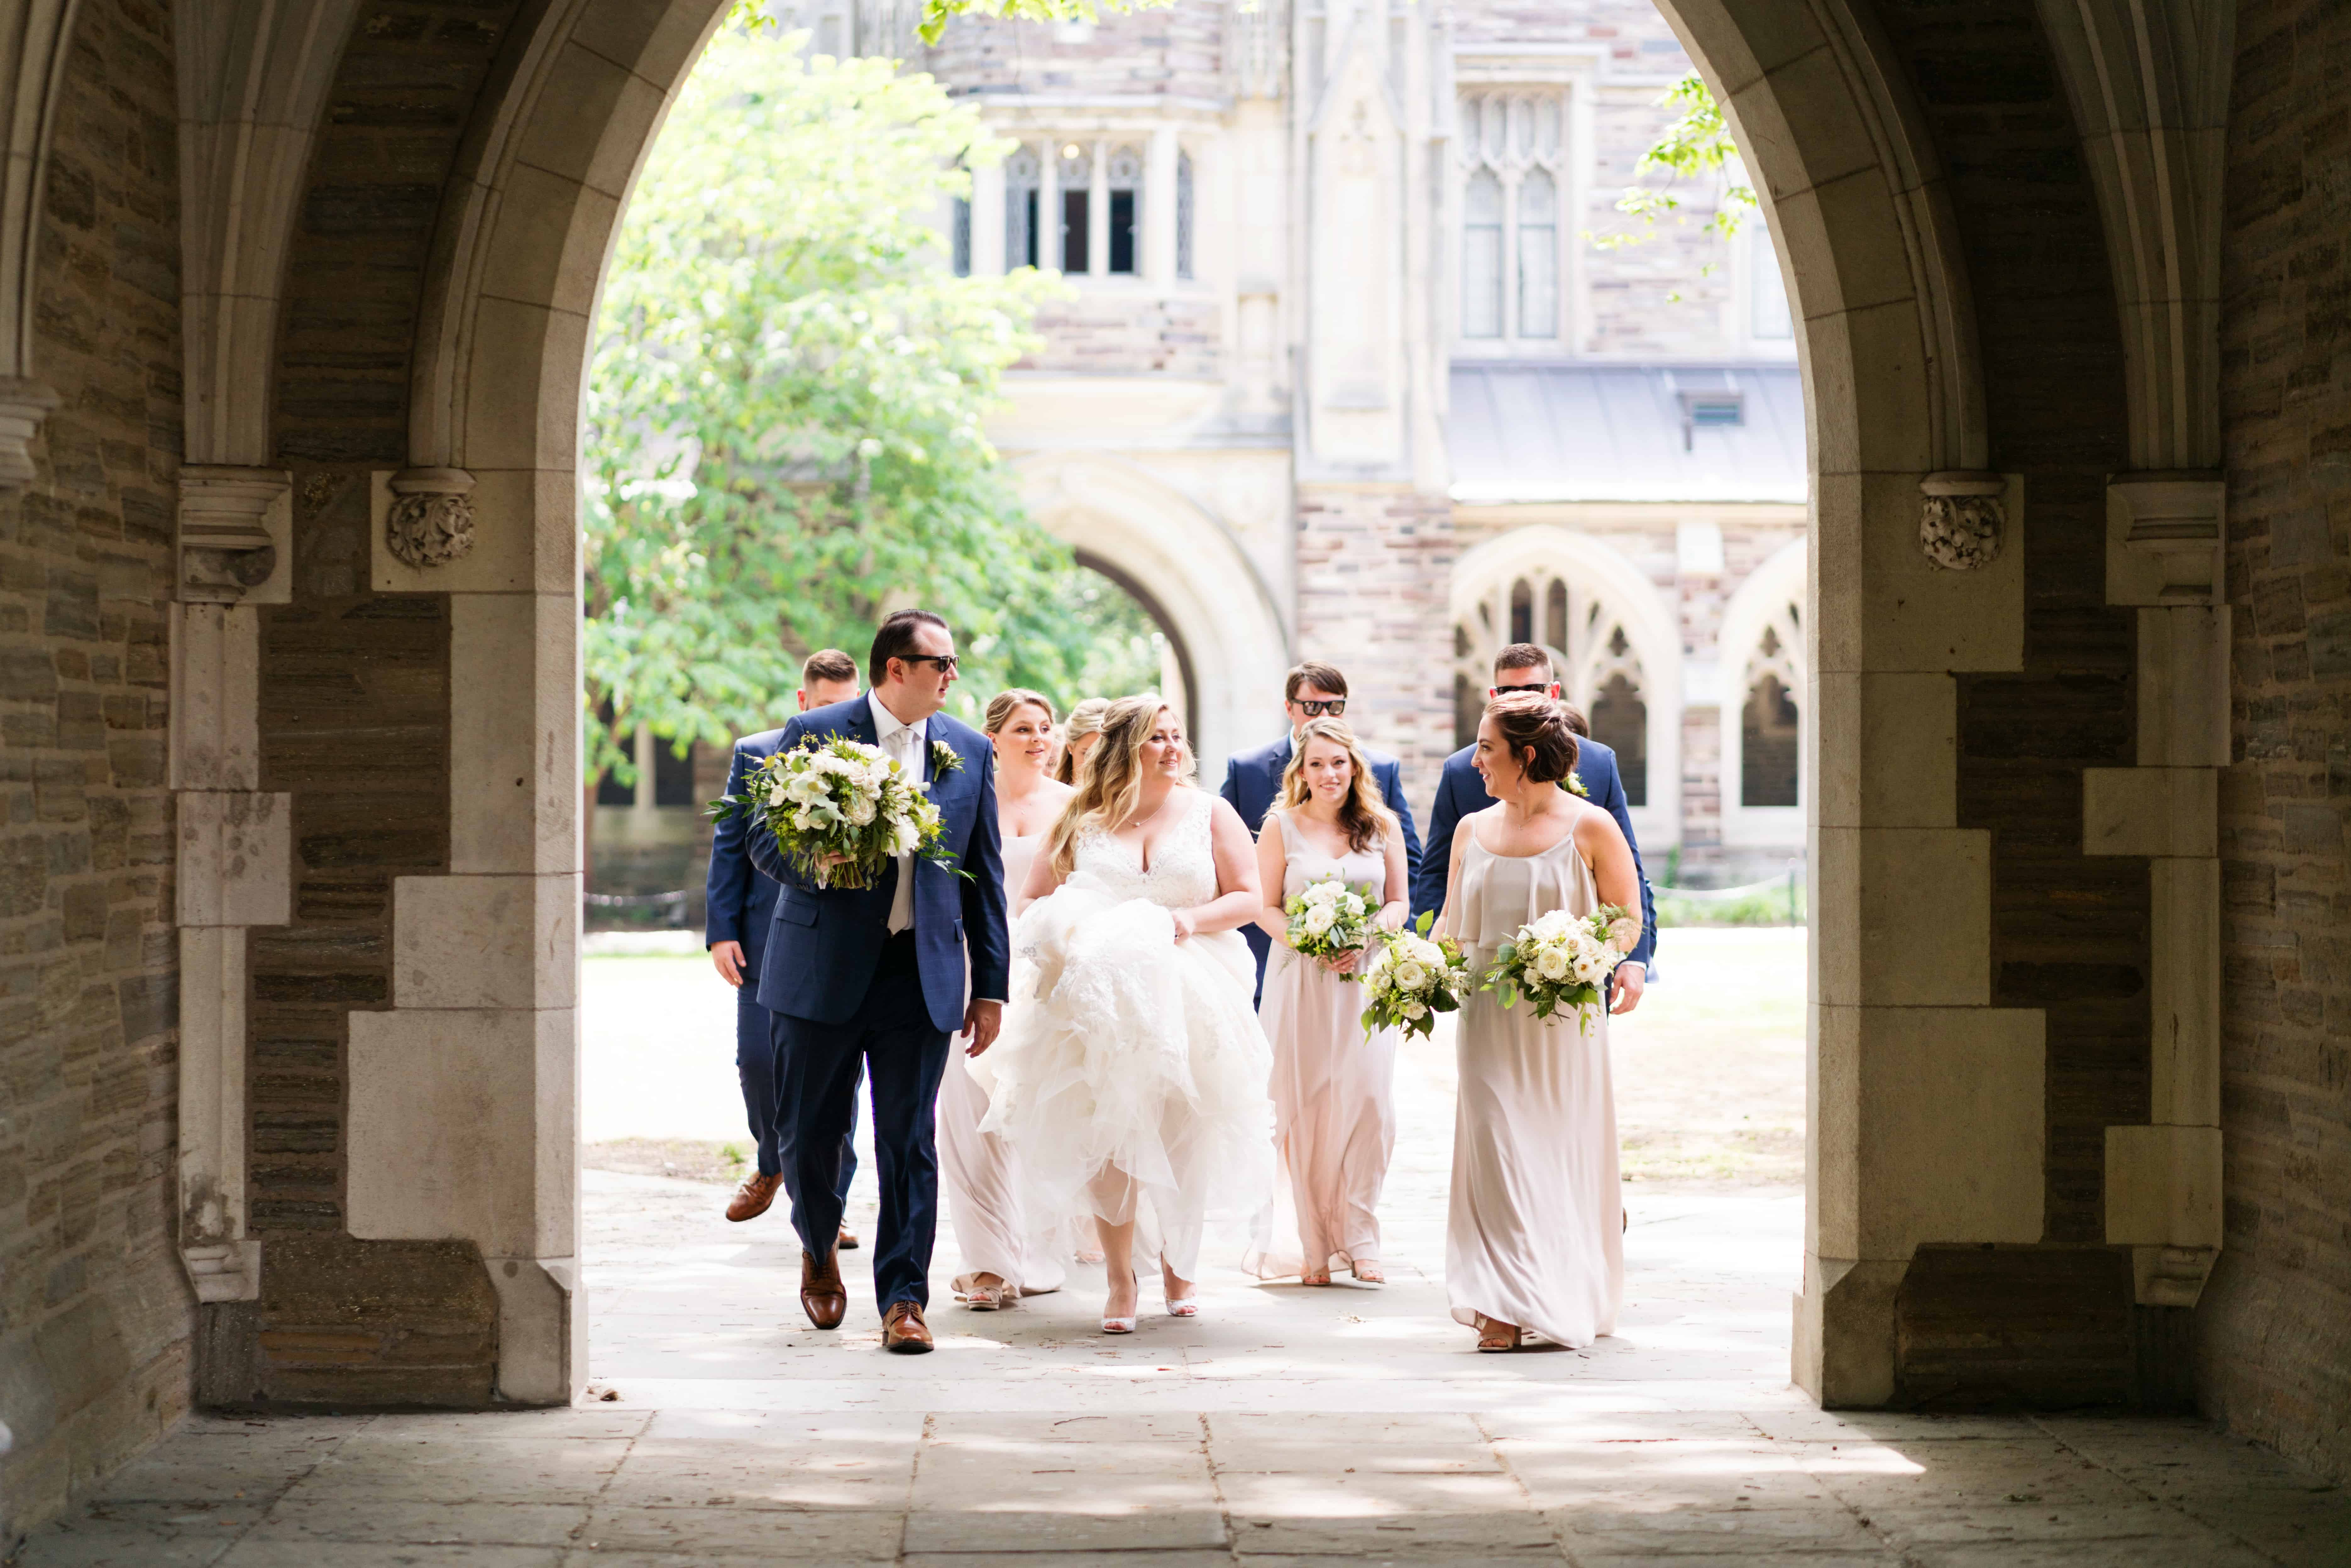 Classic Princeton University wedding photo as wedding party enters campus